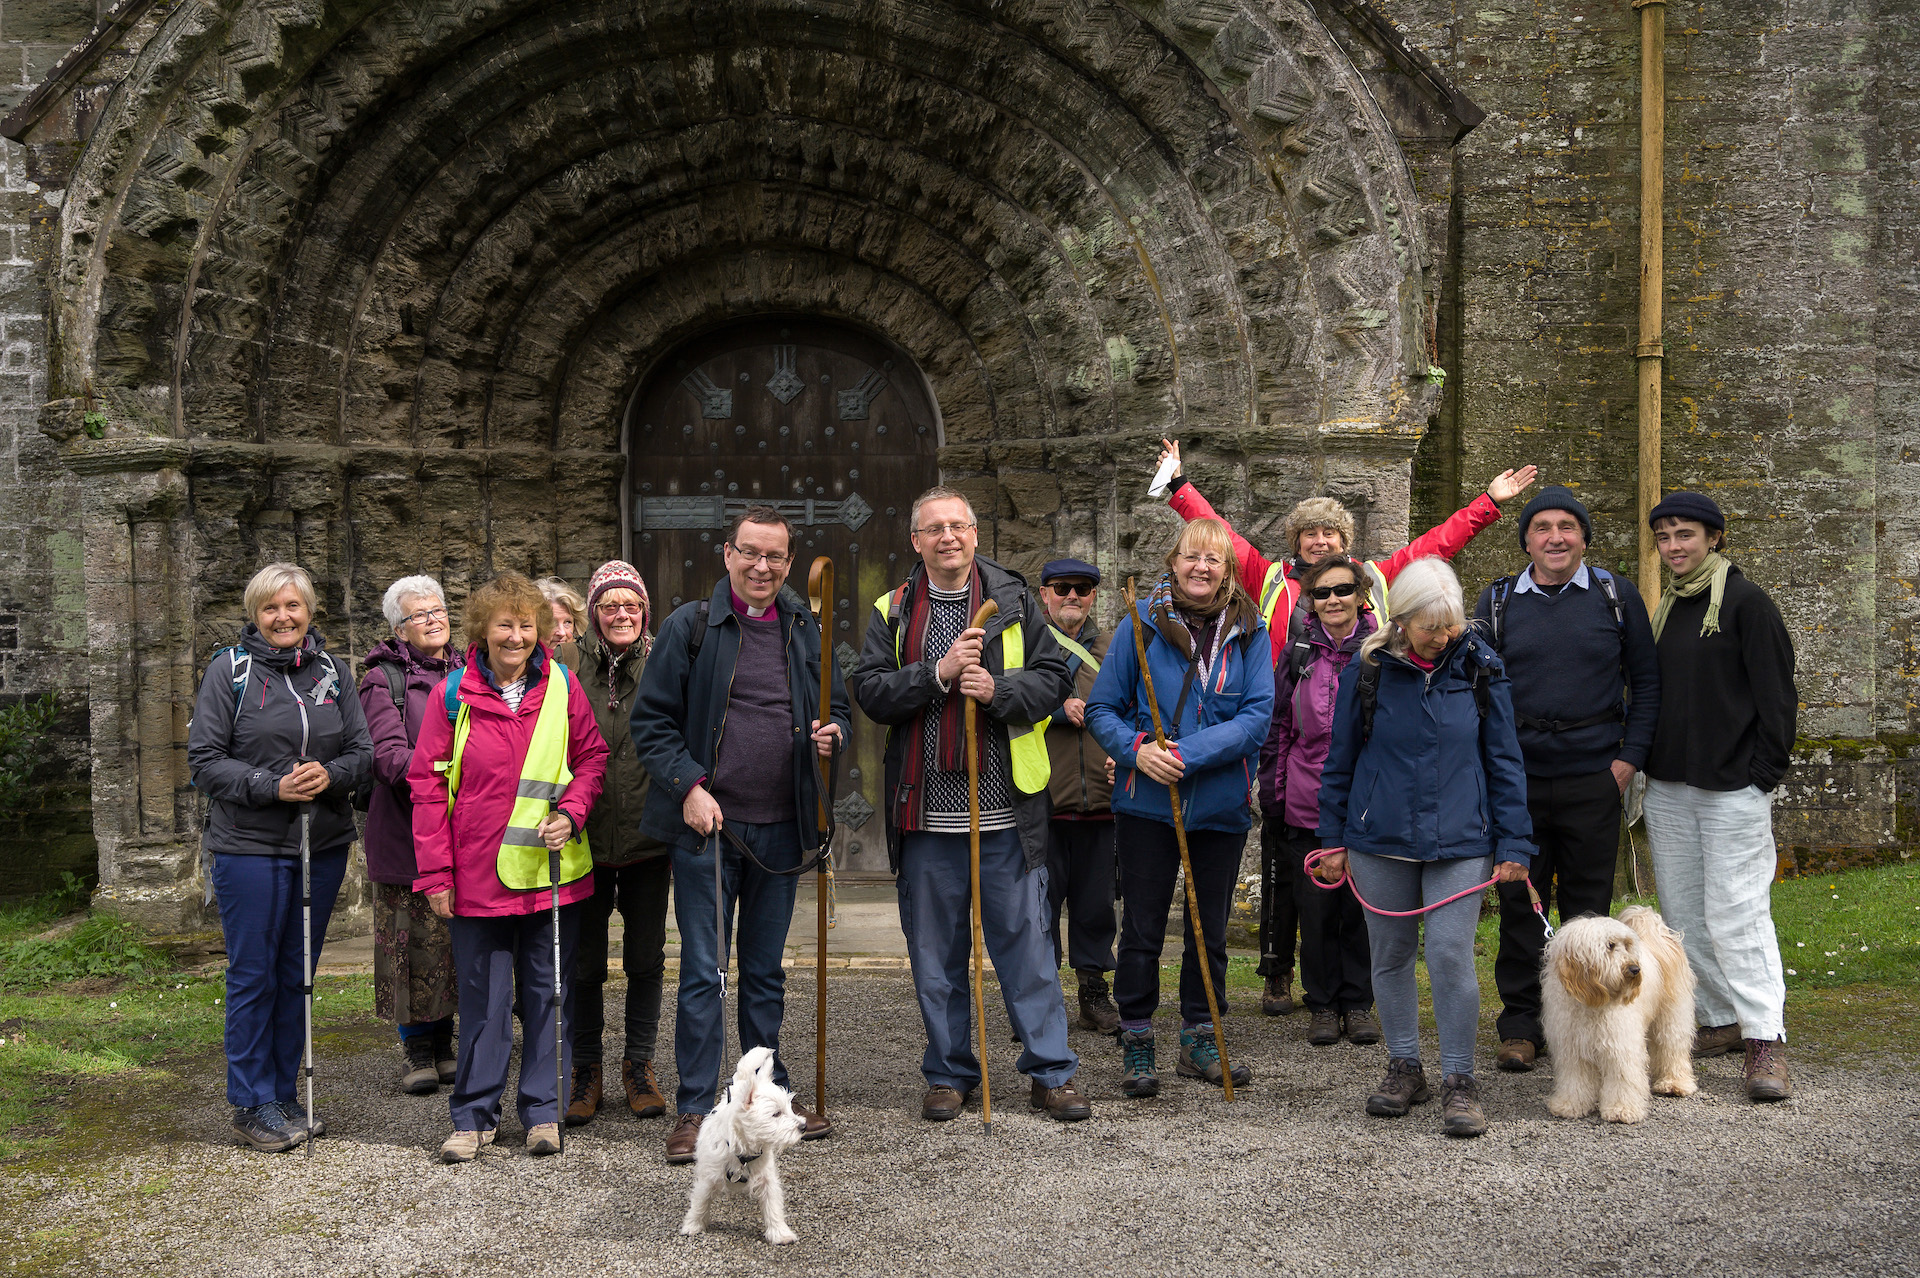 Walkers on Cornish Celtic Way